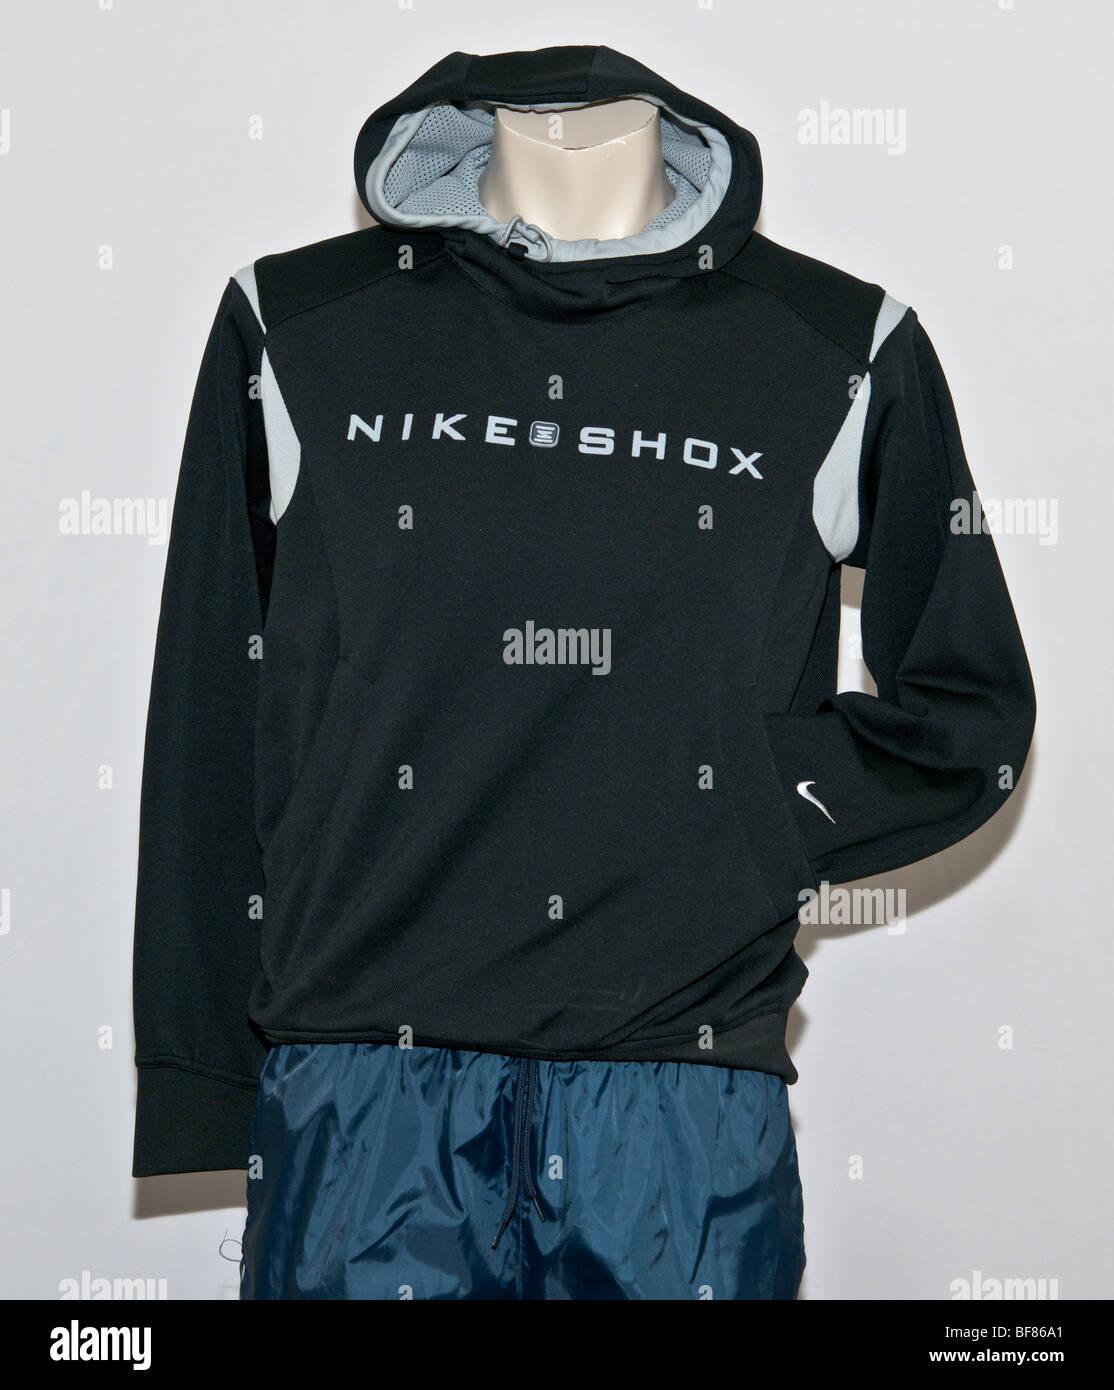 abbigliamento uomo sportivo nike